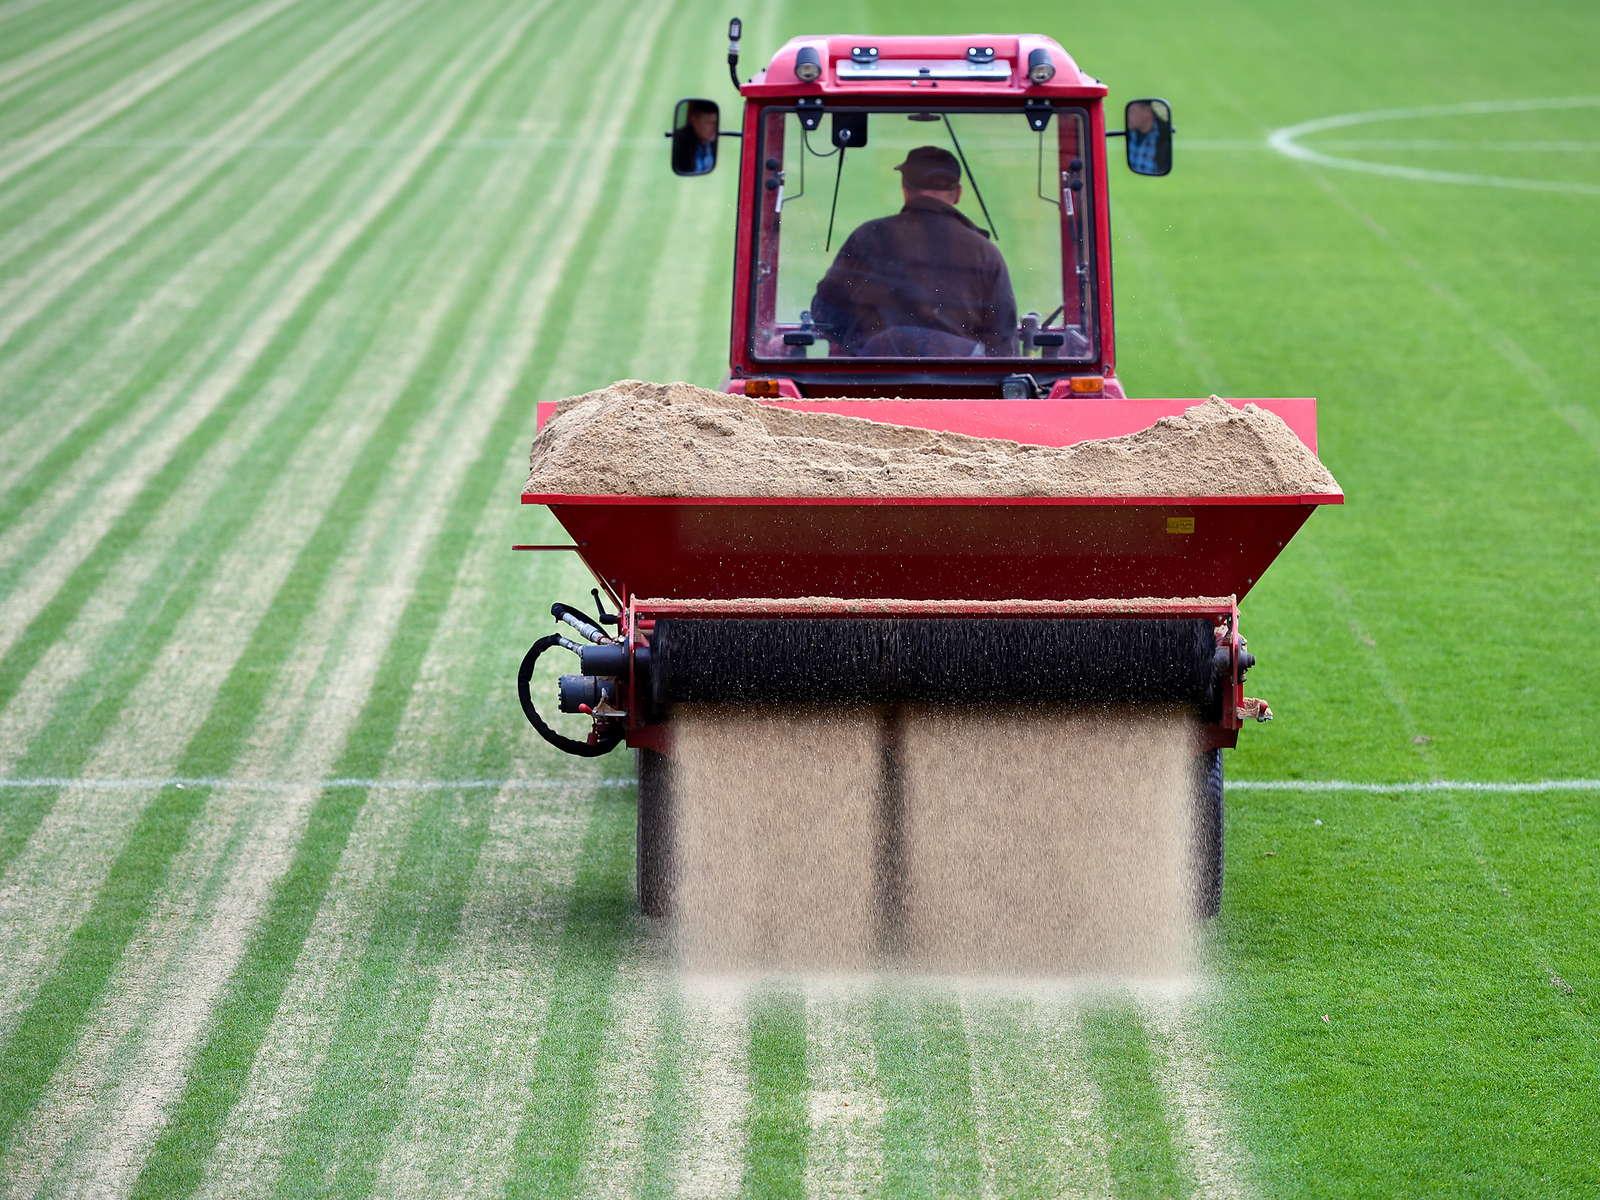 Rasen Vertikutieren, Lüften & Sanden: Was Ist Wann Am